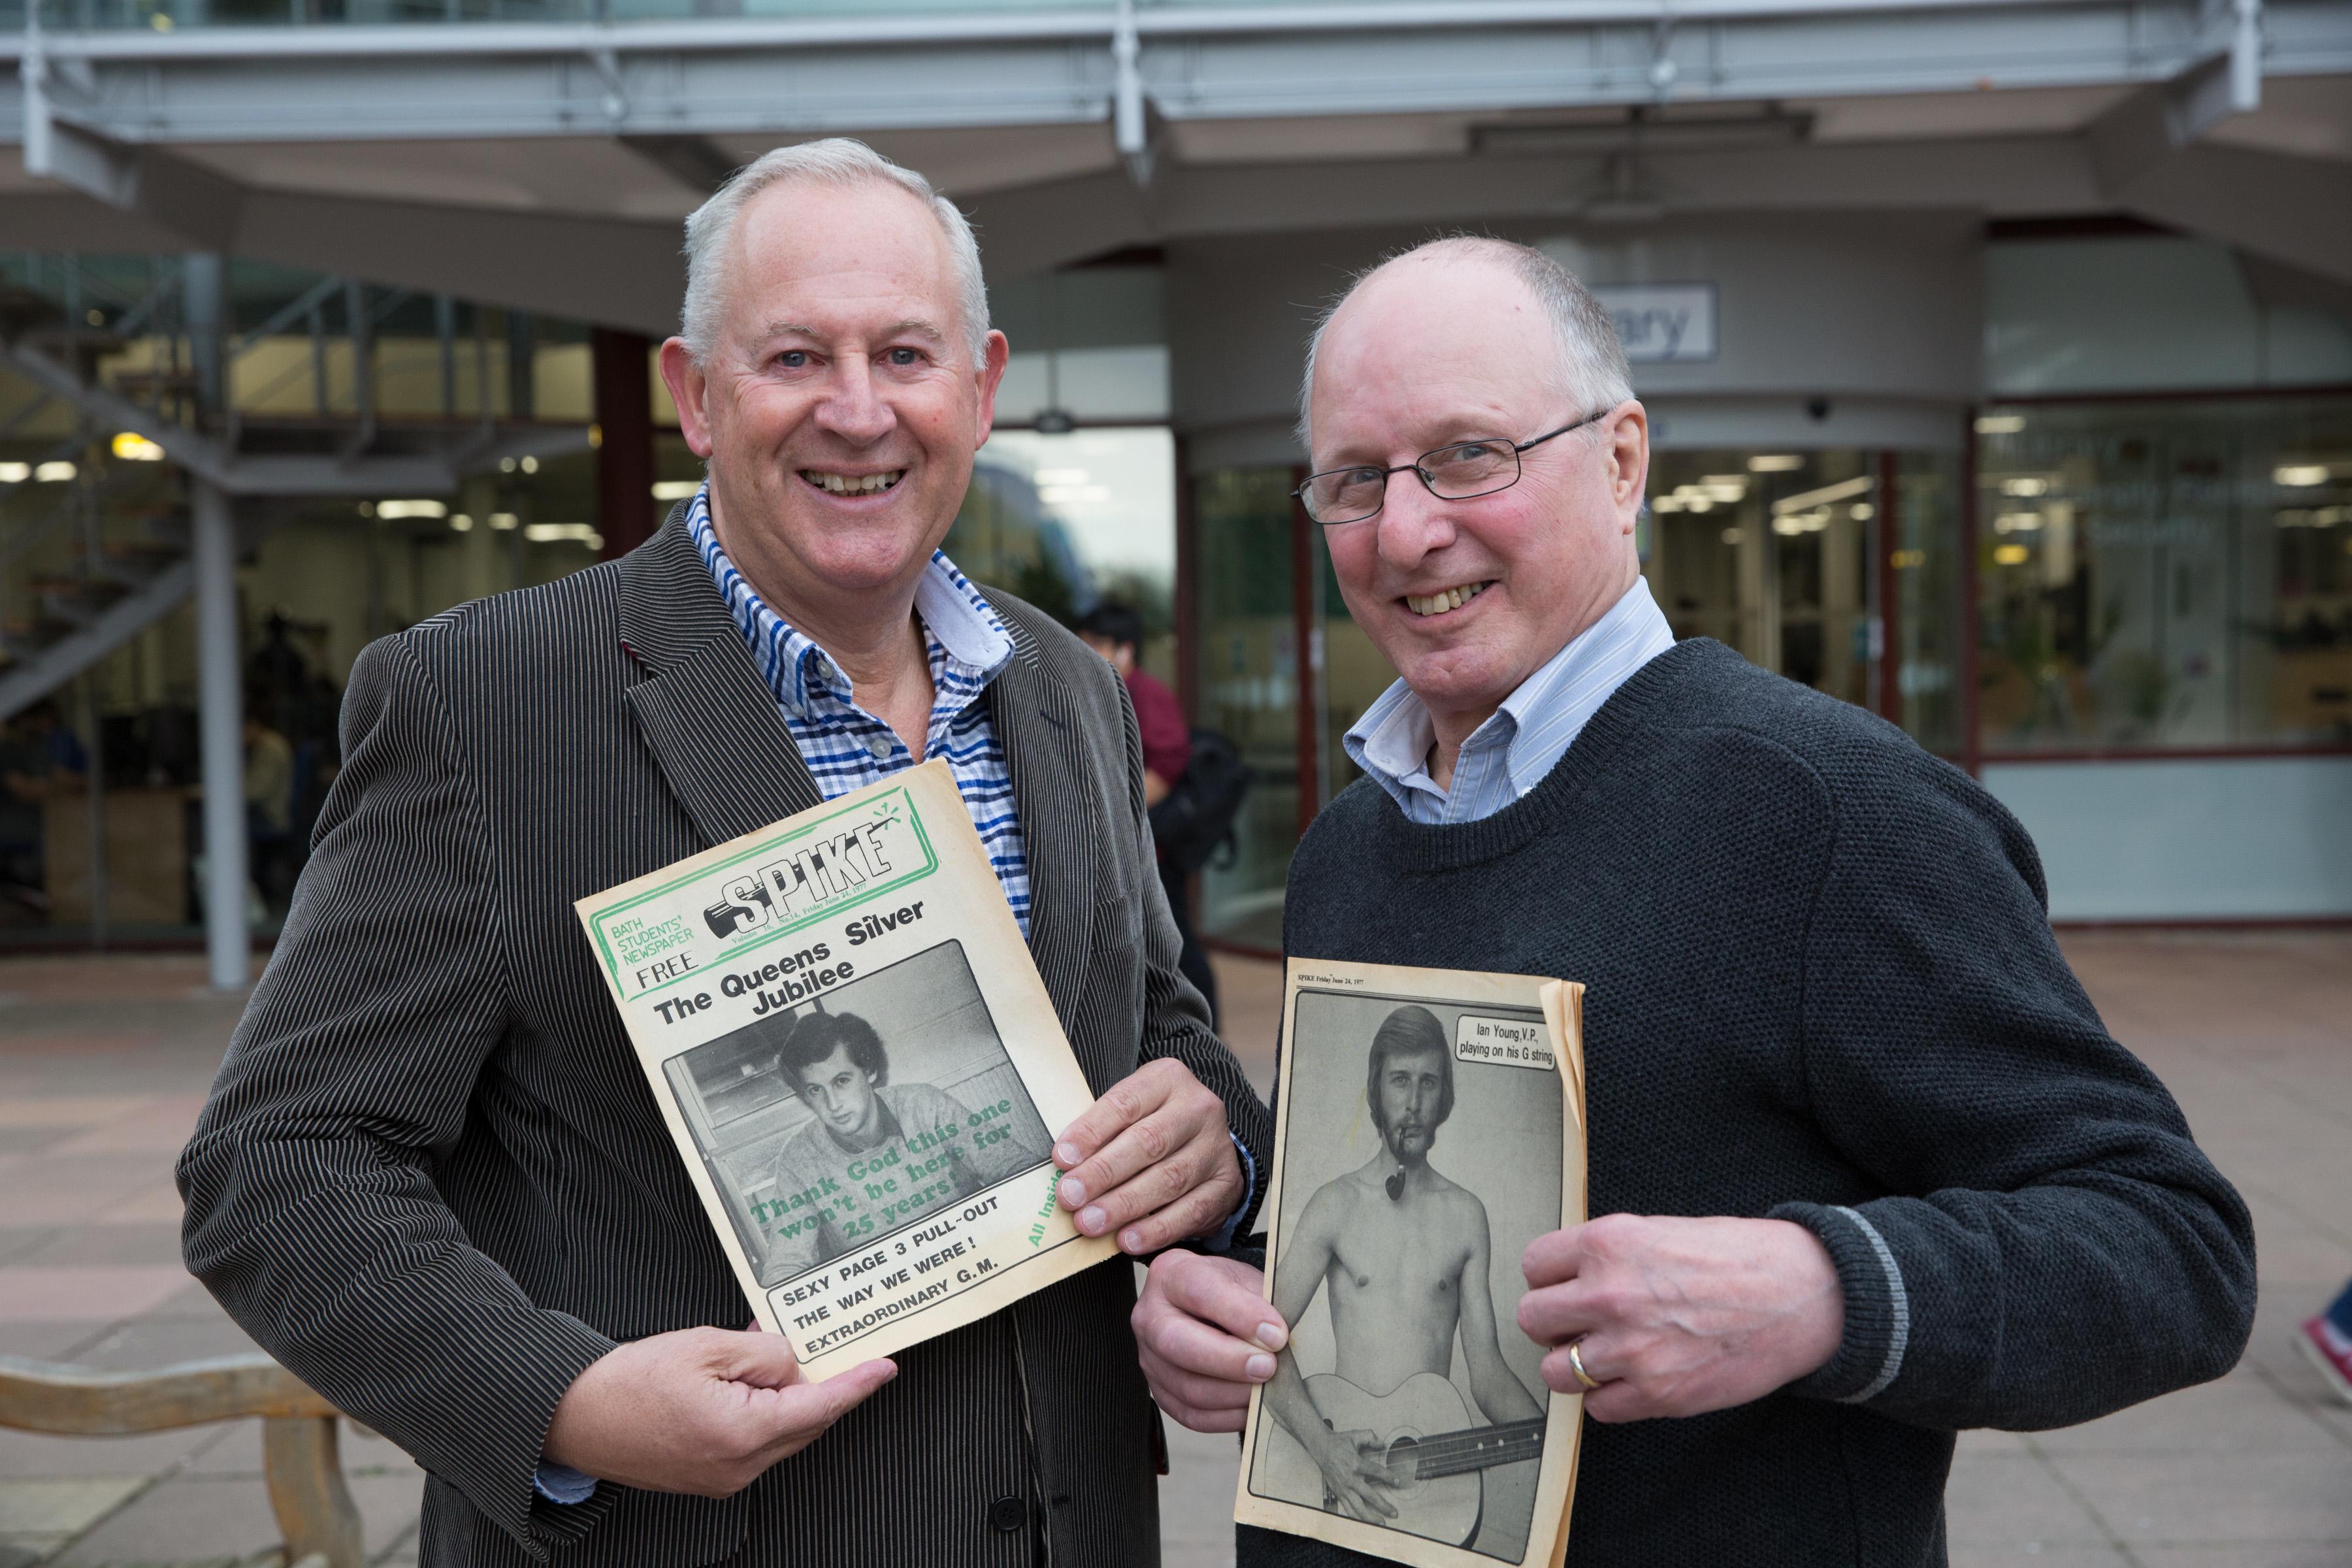 Stuart Appleton and Ian Young